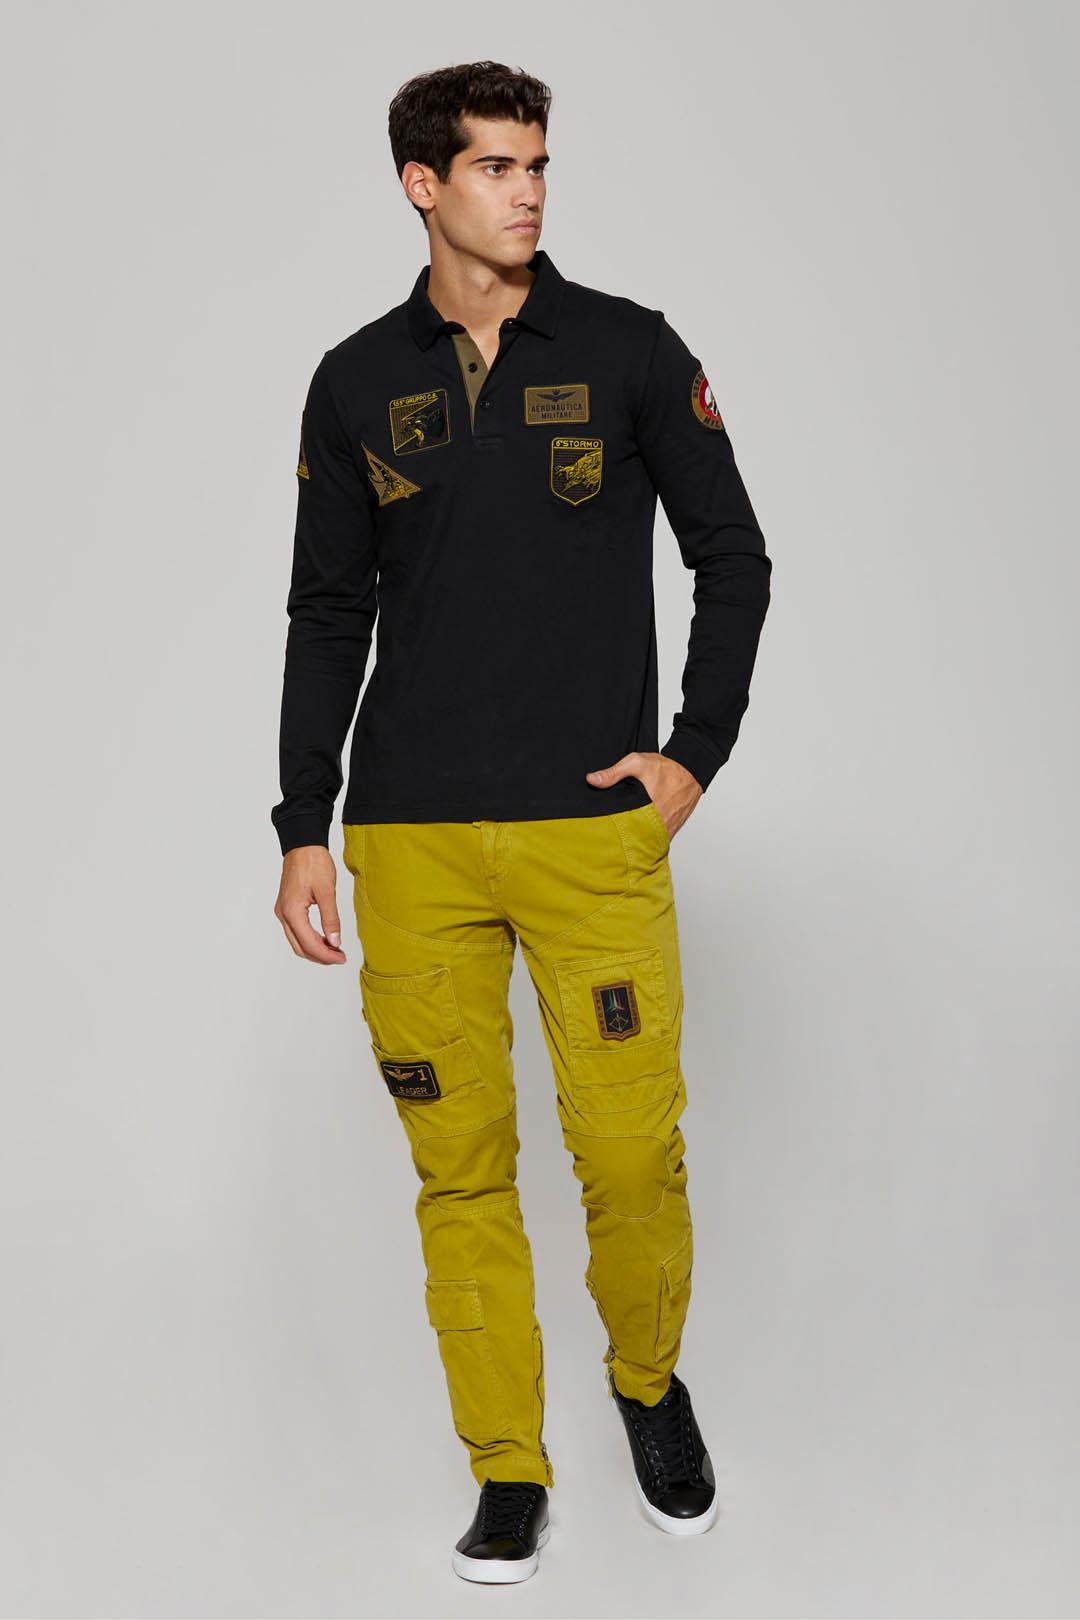 Poloshirt mit Patches                    4